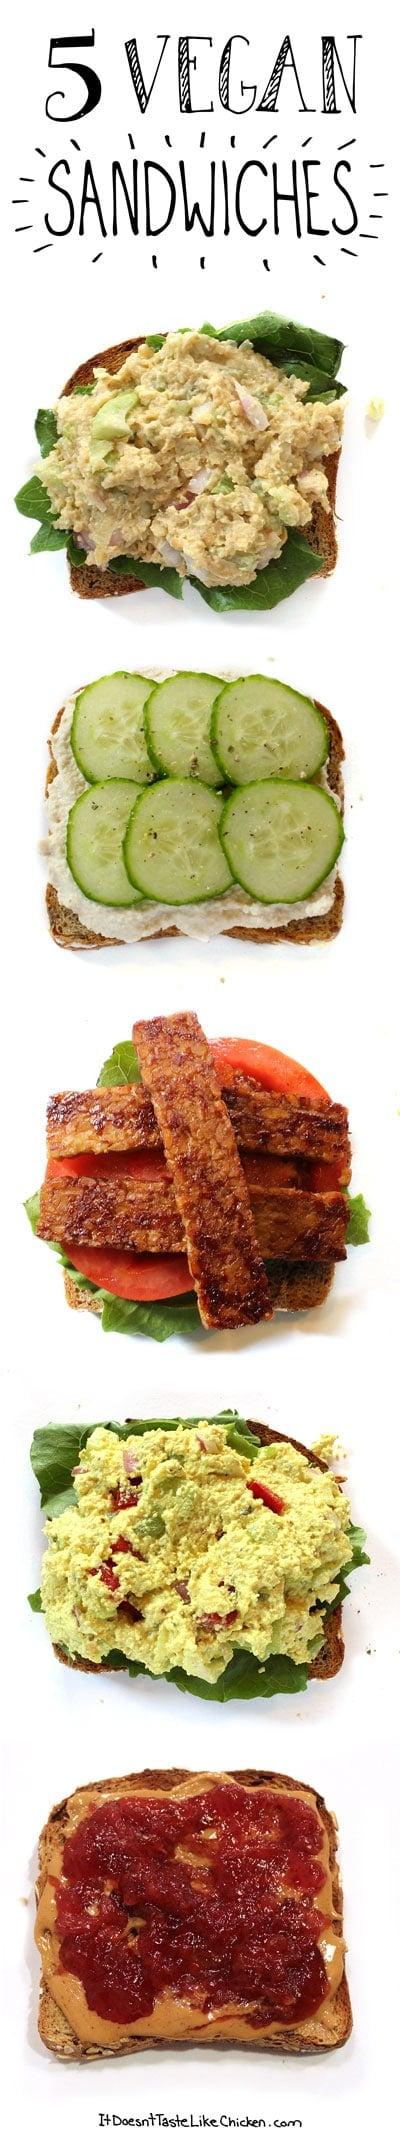 5-vegan-sandwiches